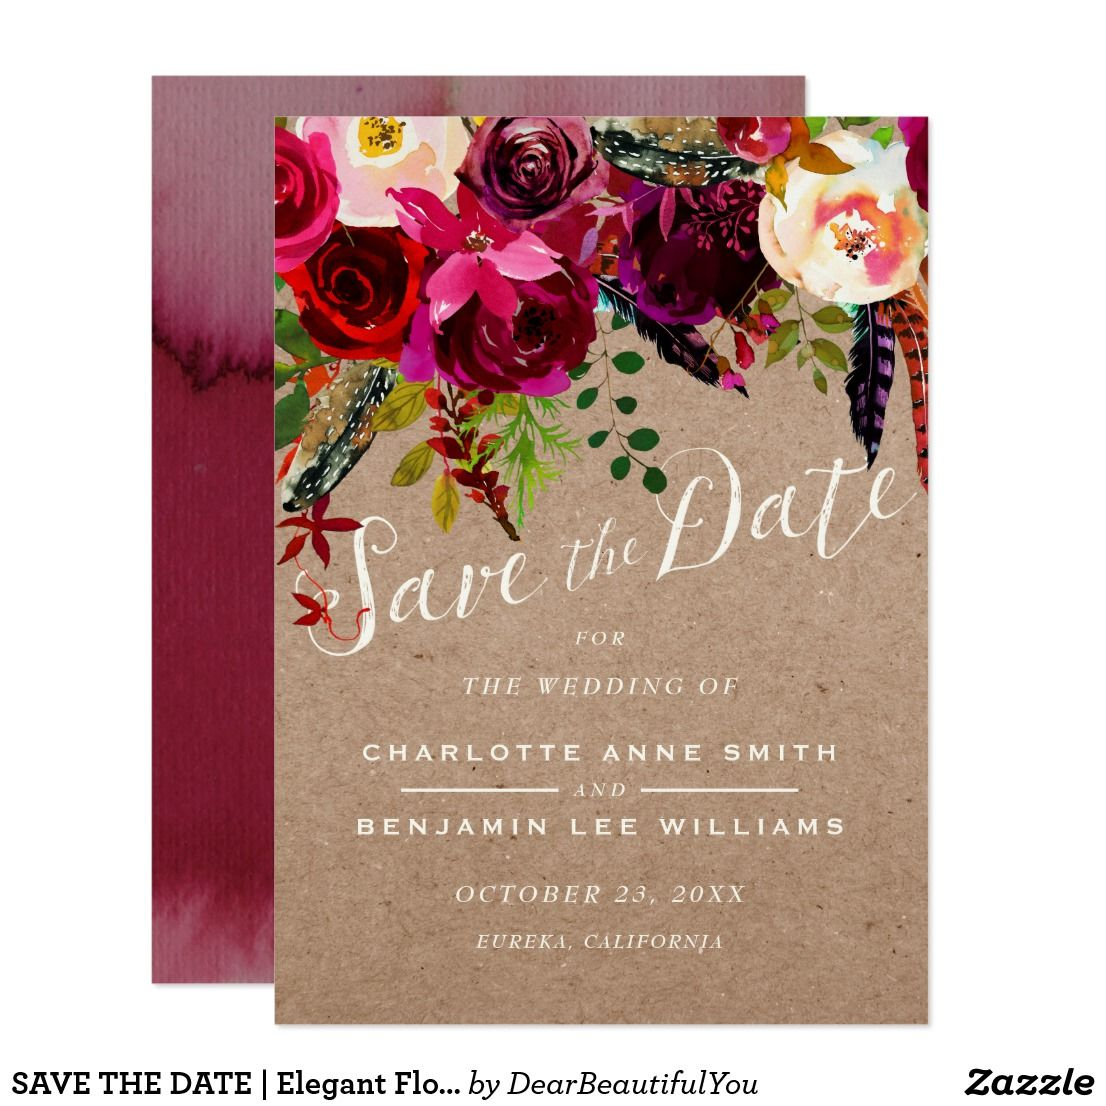 SAVE THE DATE | Elegant Floral Rustic Boho Wedding | Rustic boho ...